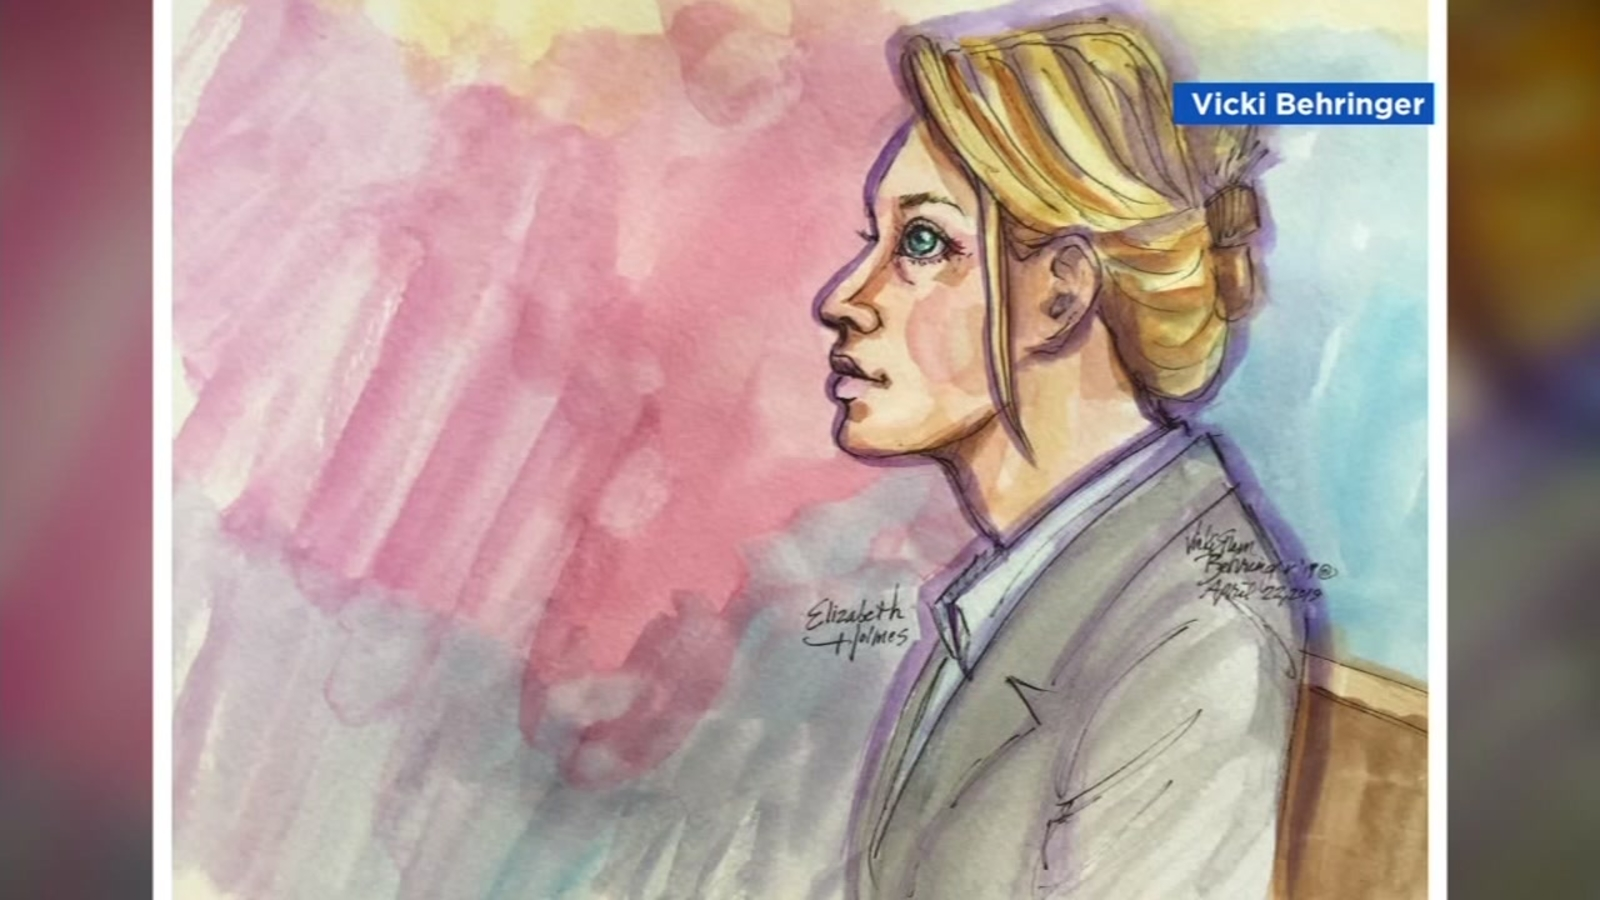 Theranos founder Elizabeth Holmes due in court